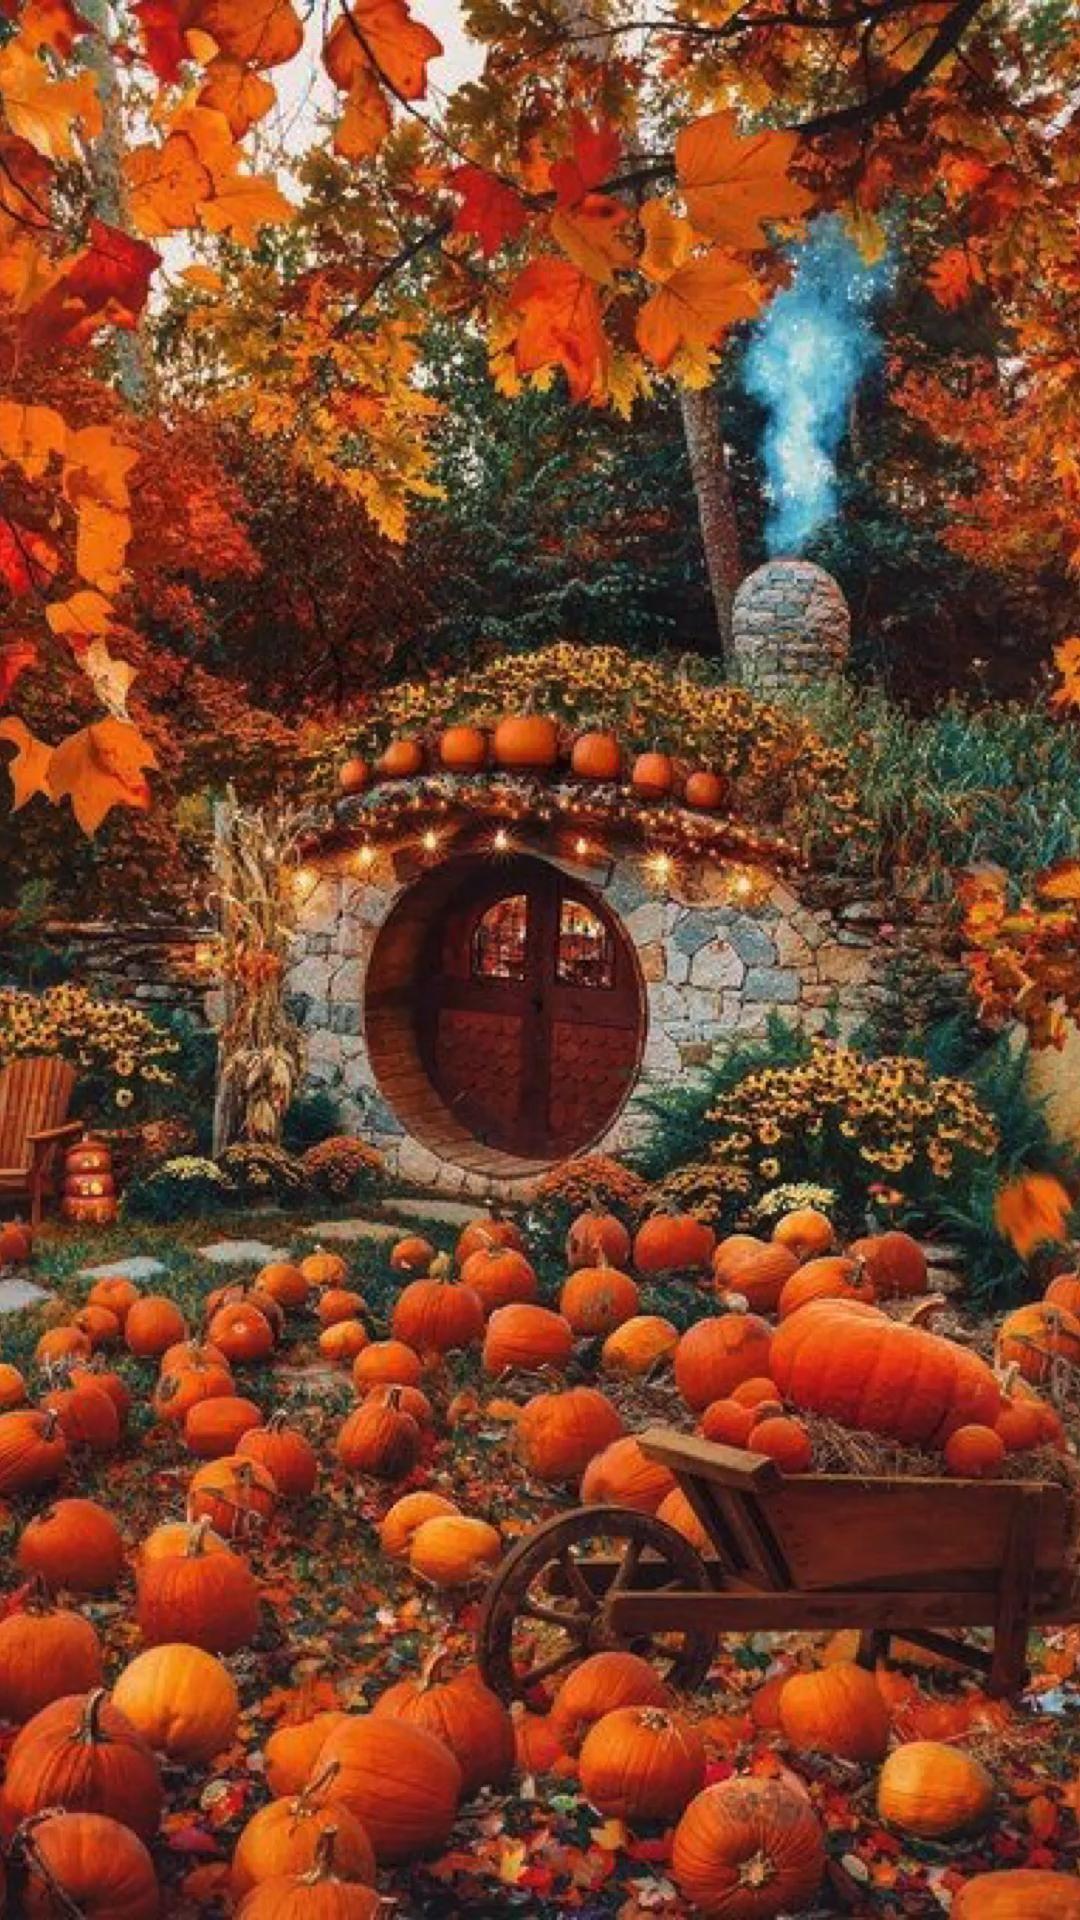 more fall stuff